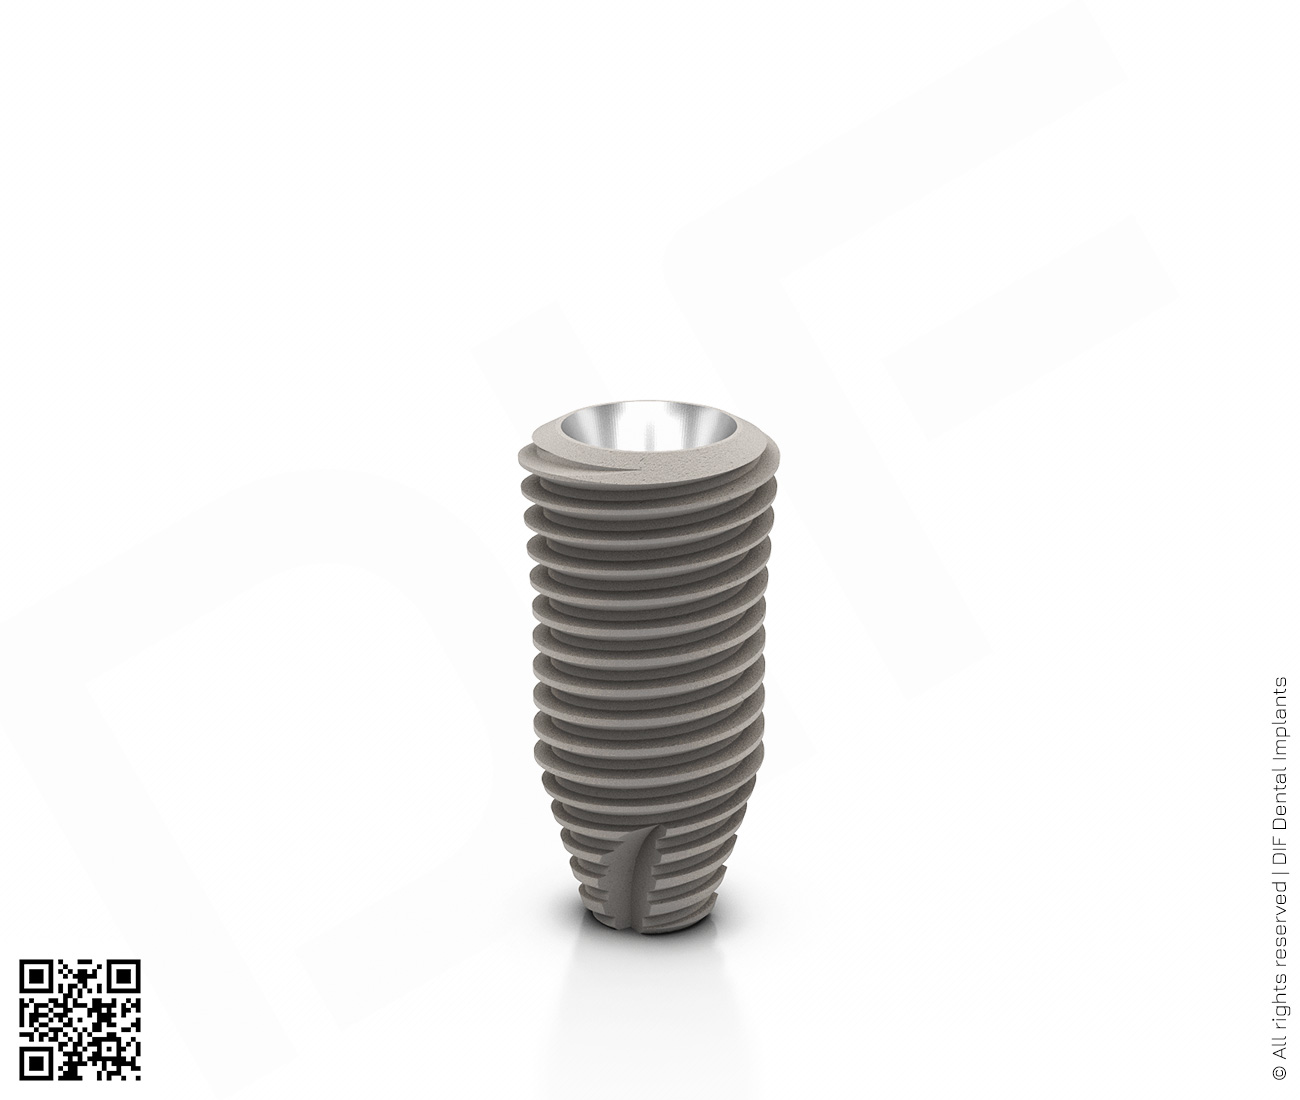 Фото имплантат mainstream fine d5.0 мм – l10.0 мм  производства DIF.